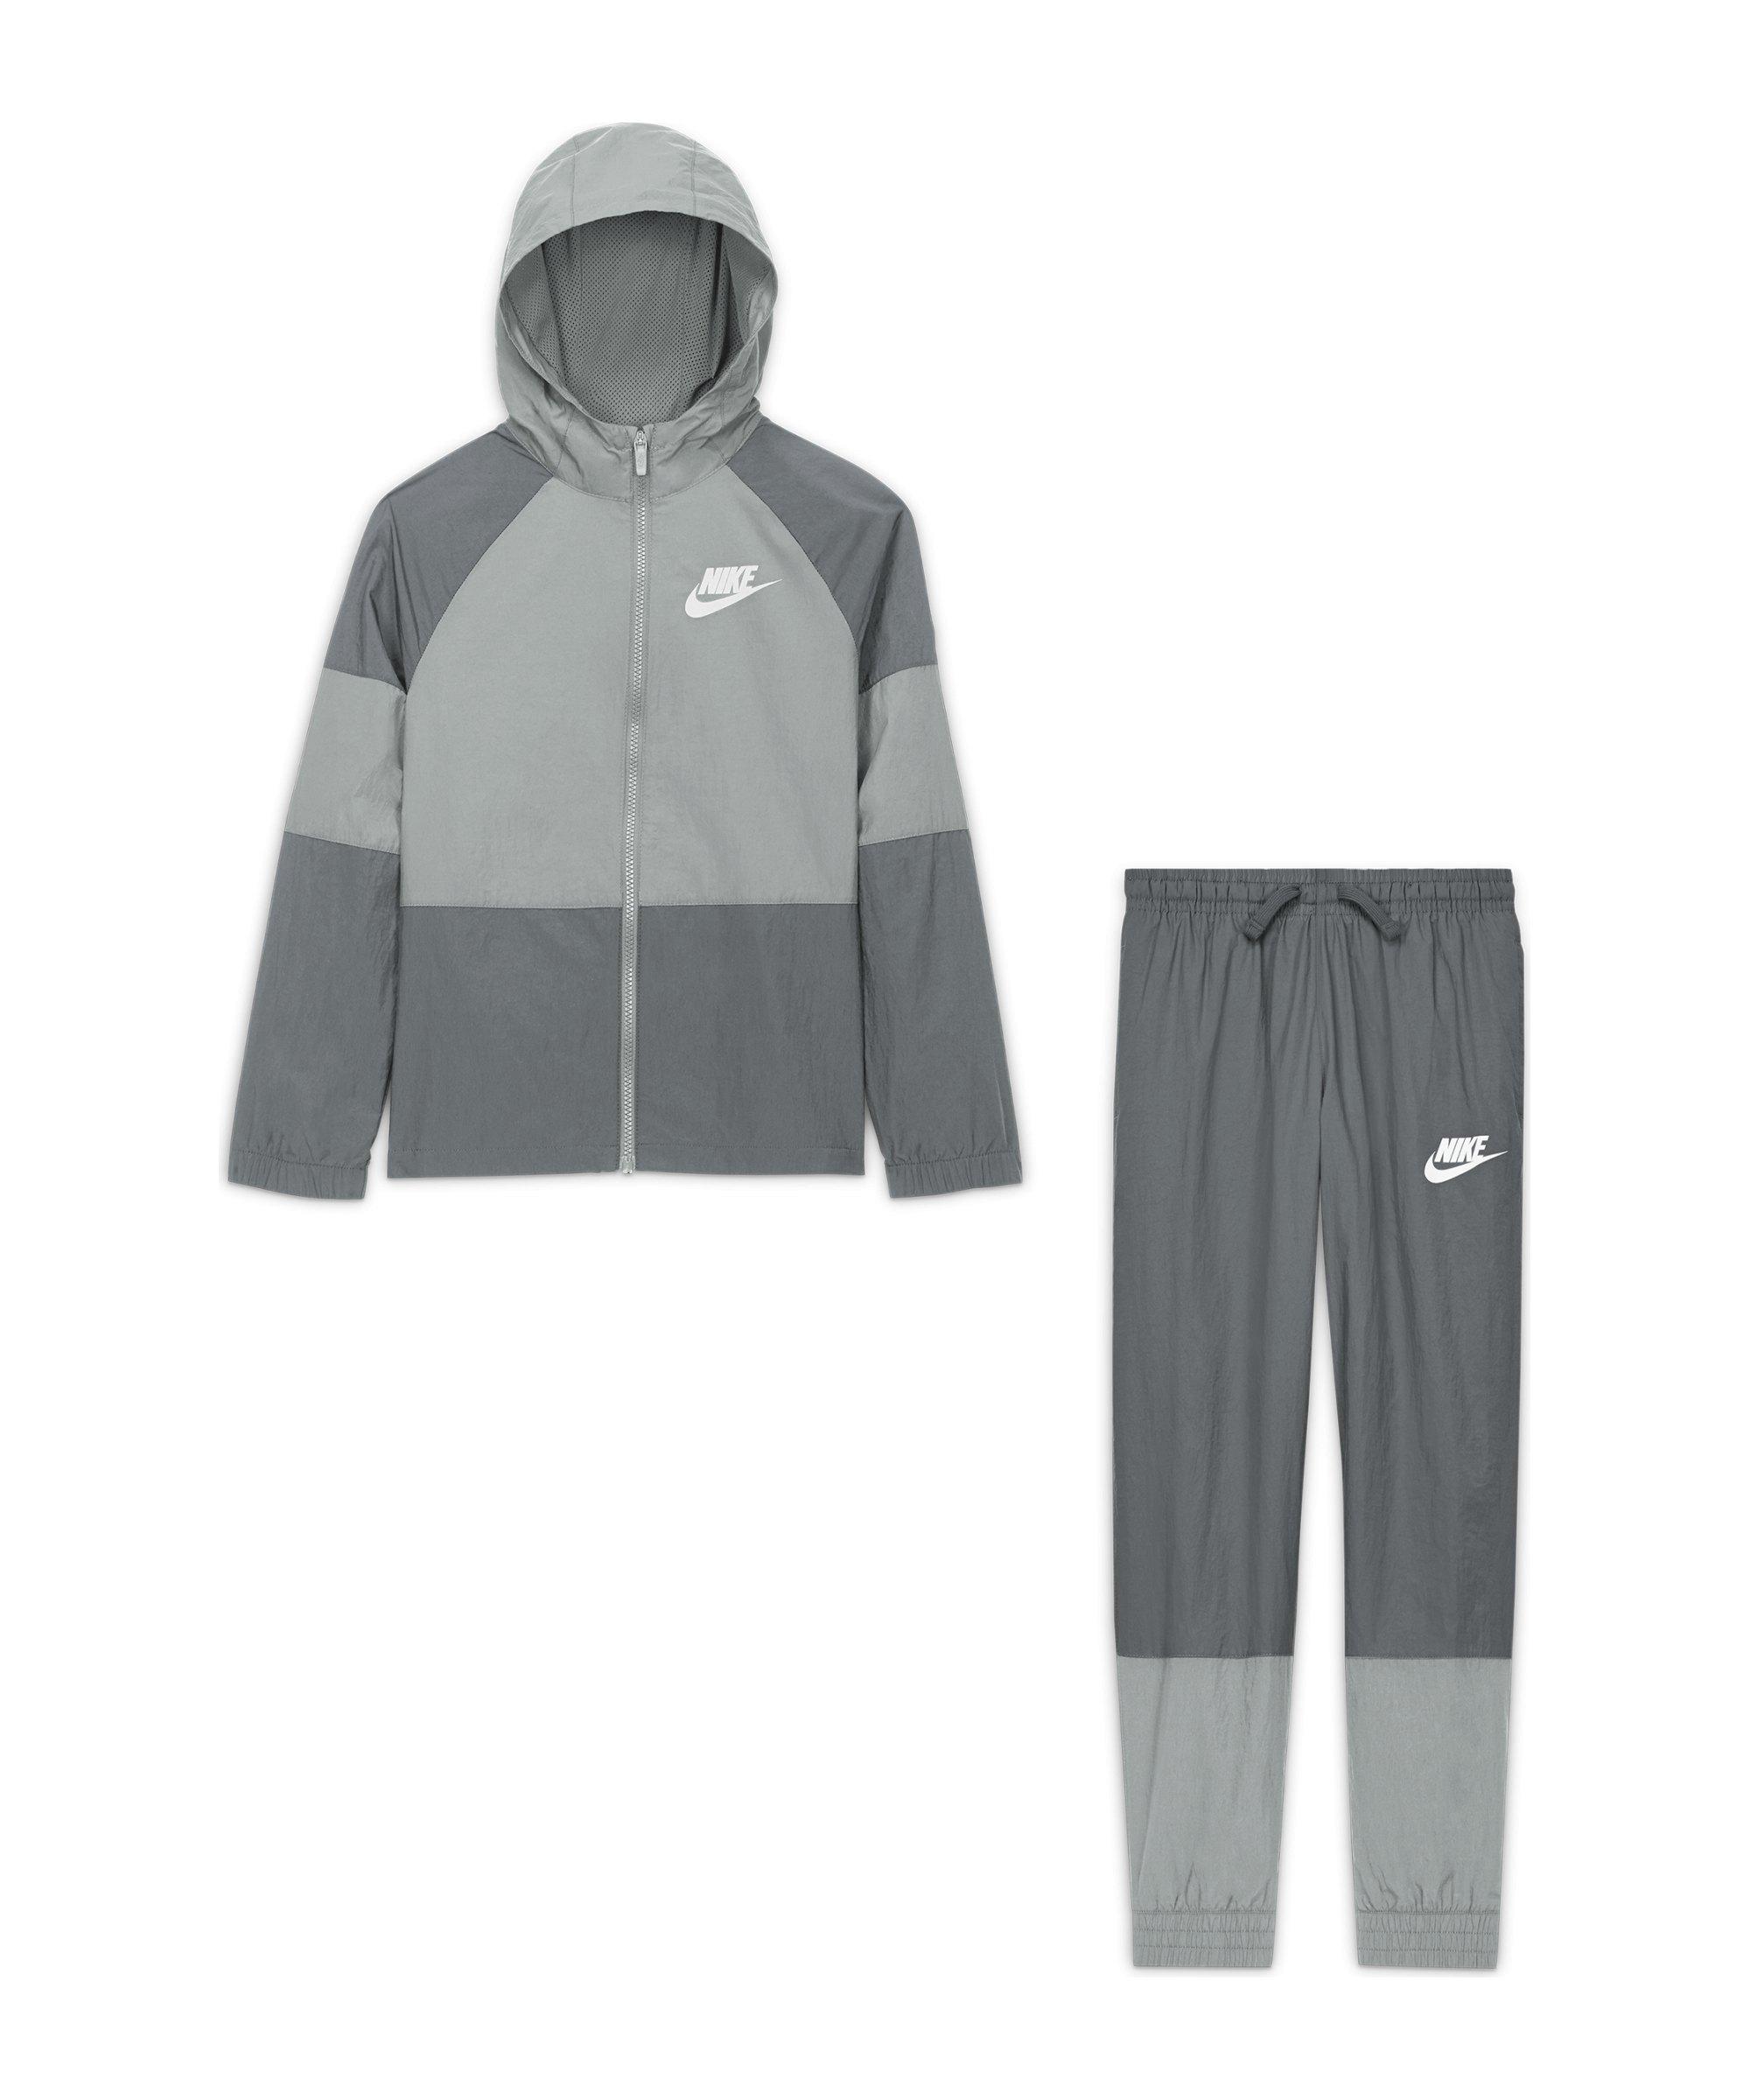 Nike HBR Woven Freizeitanzug Kids Grau F077 - grau